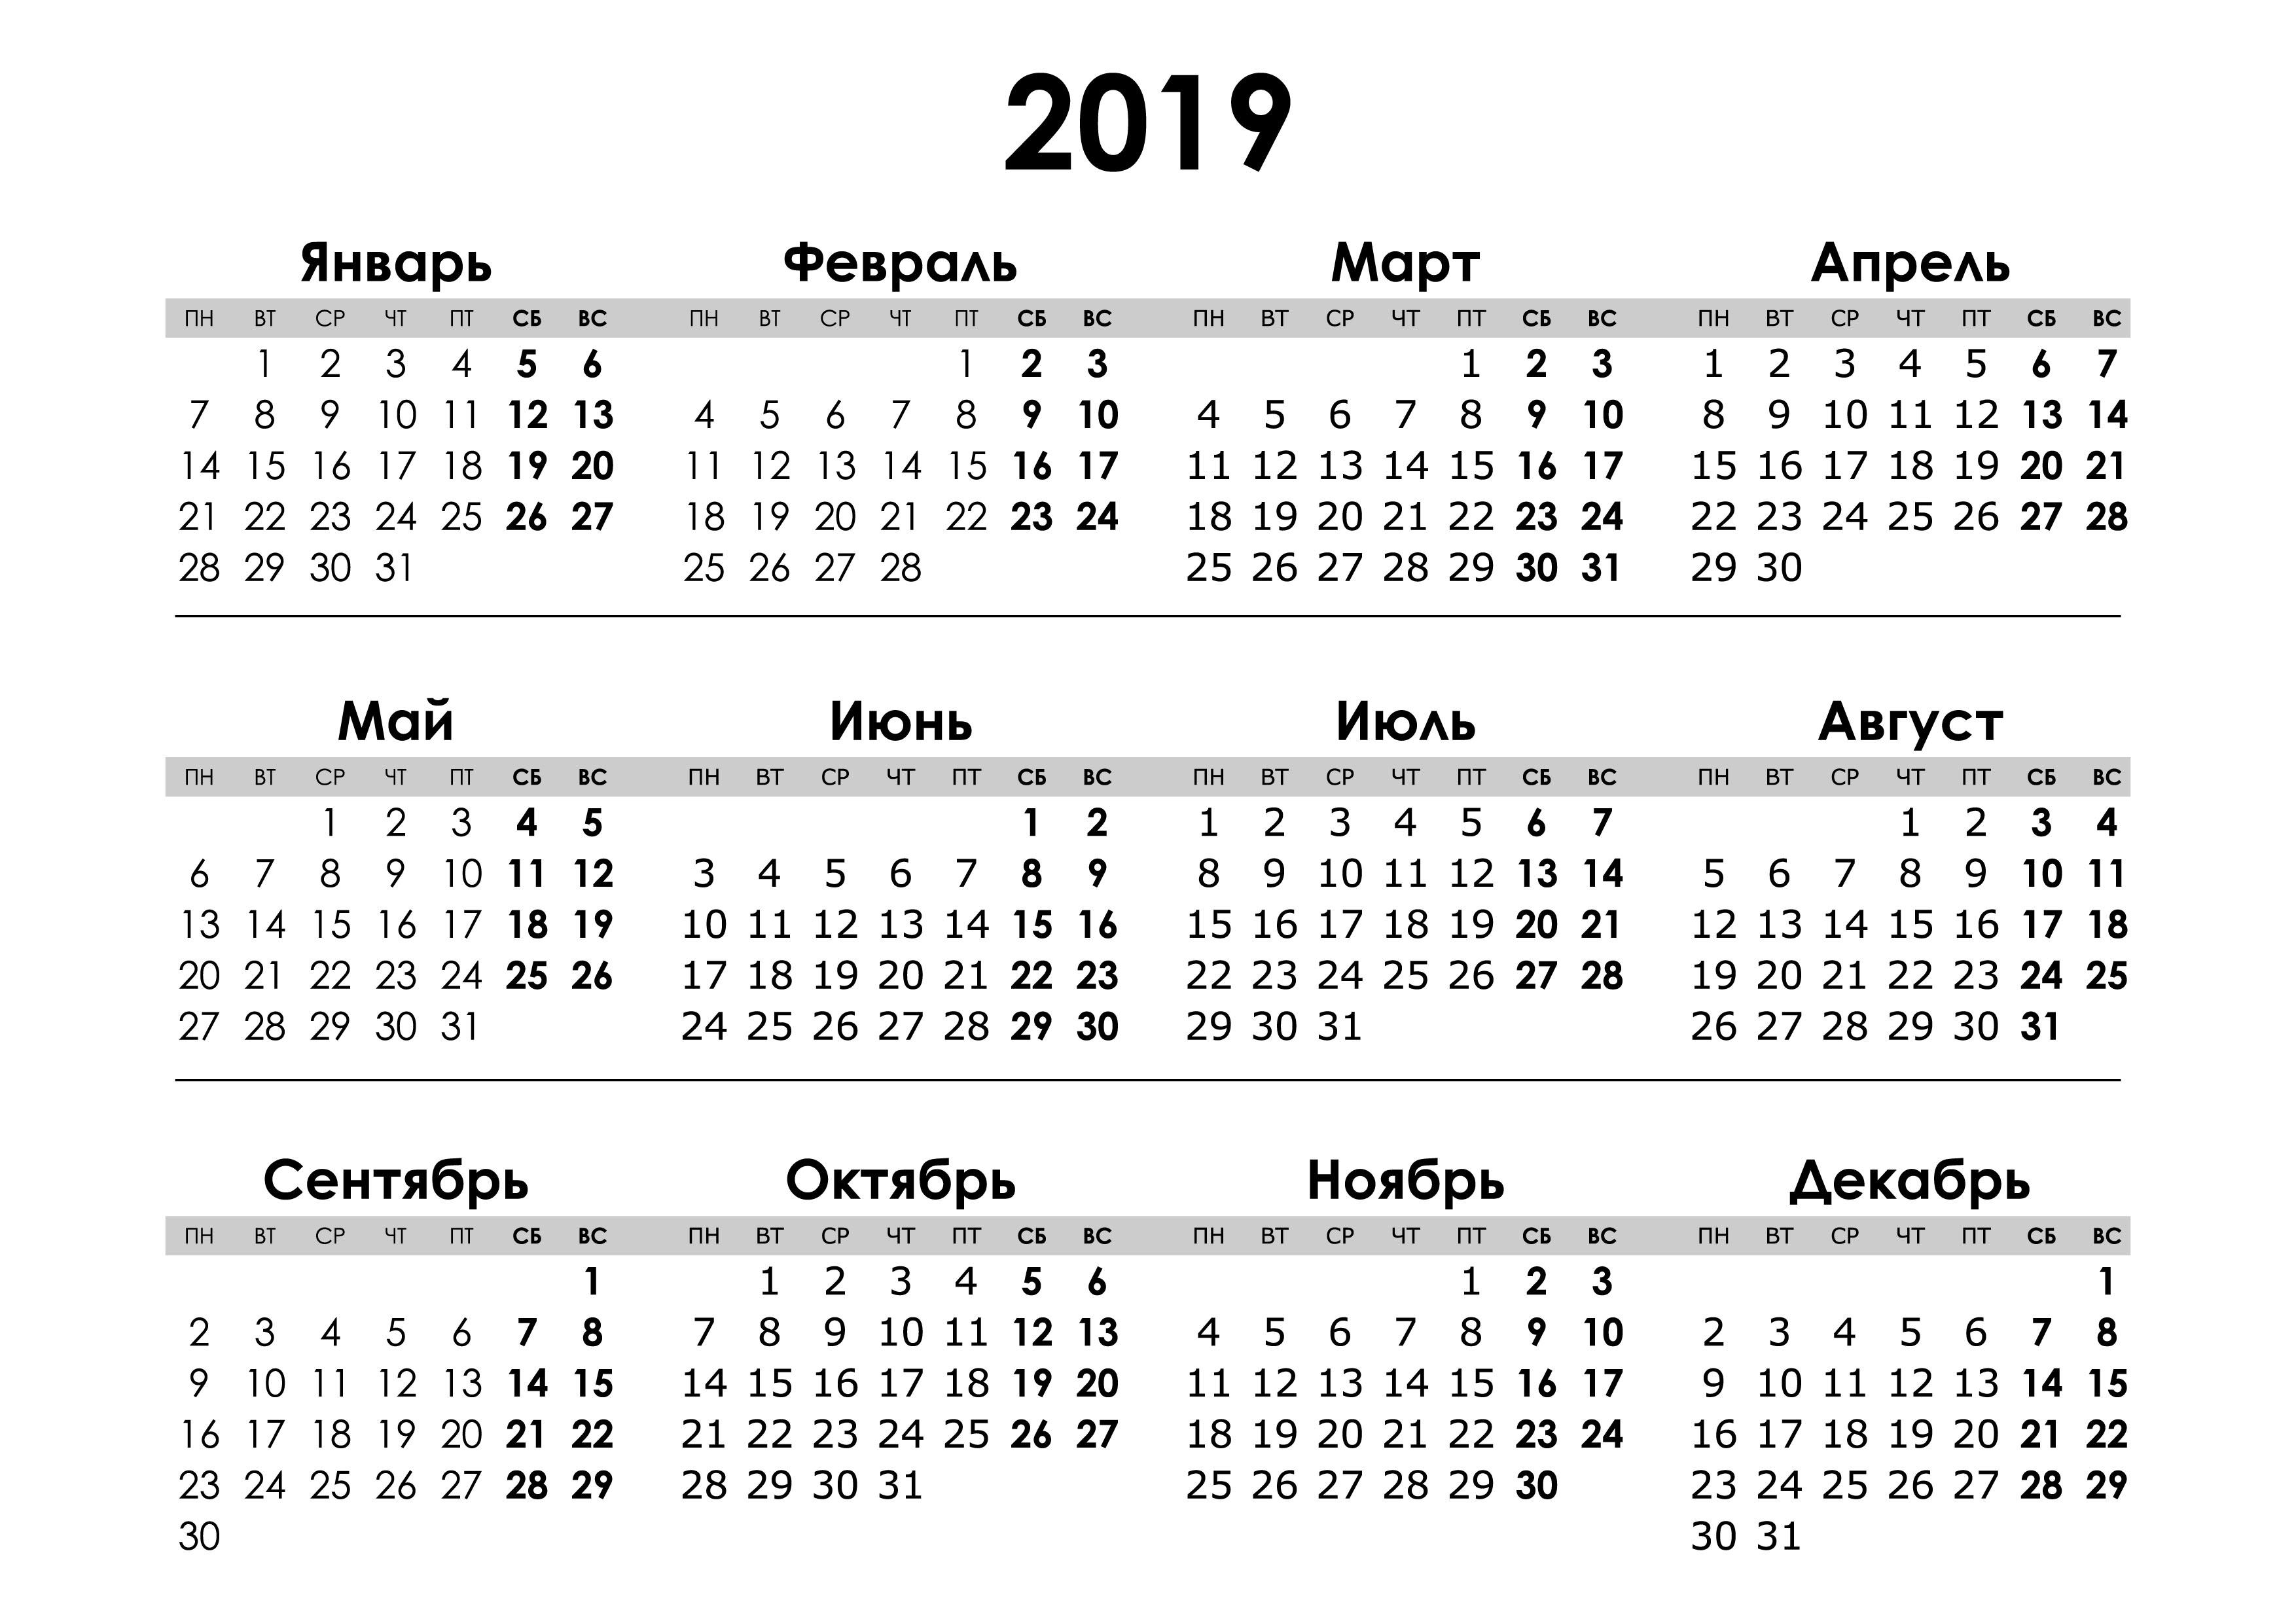 Картинка календарь 2019 года по месяцам, год месяца открытки